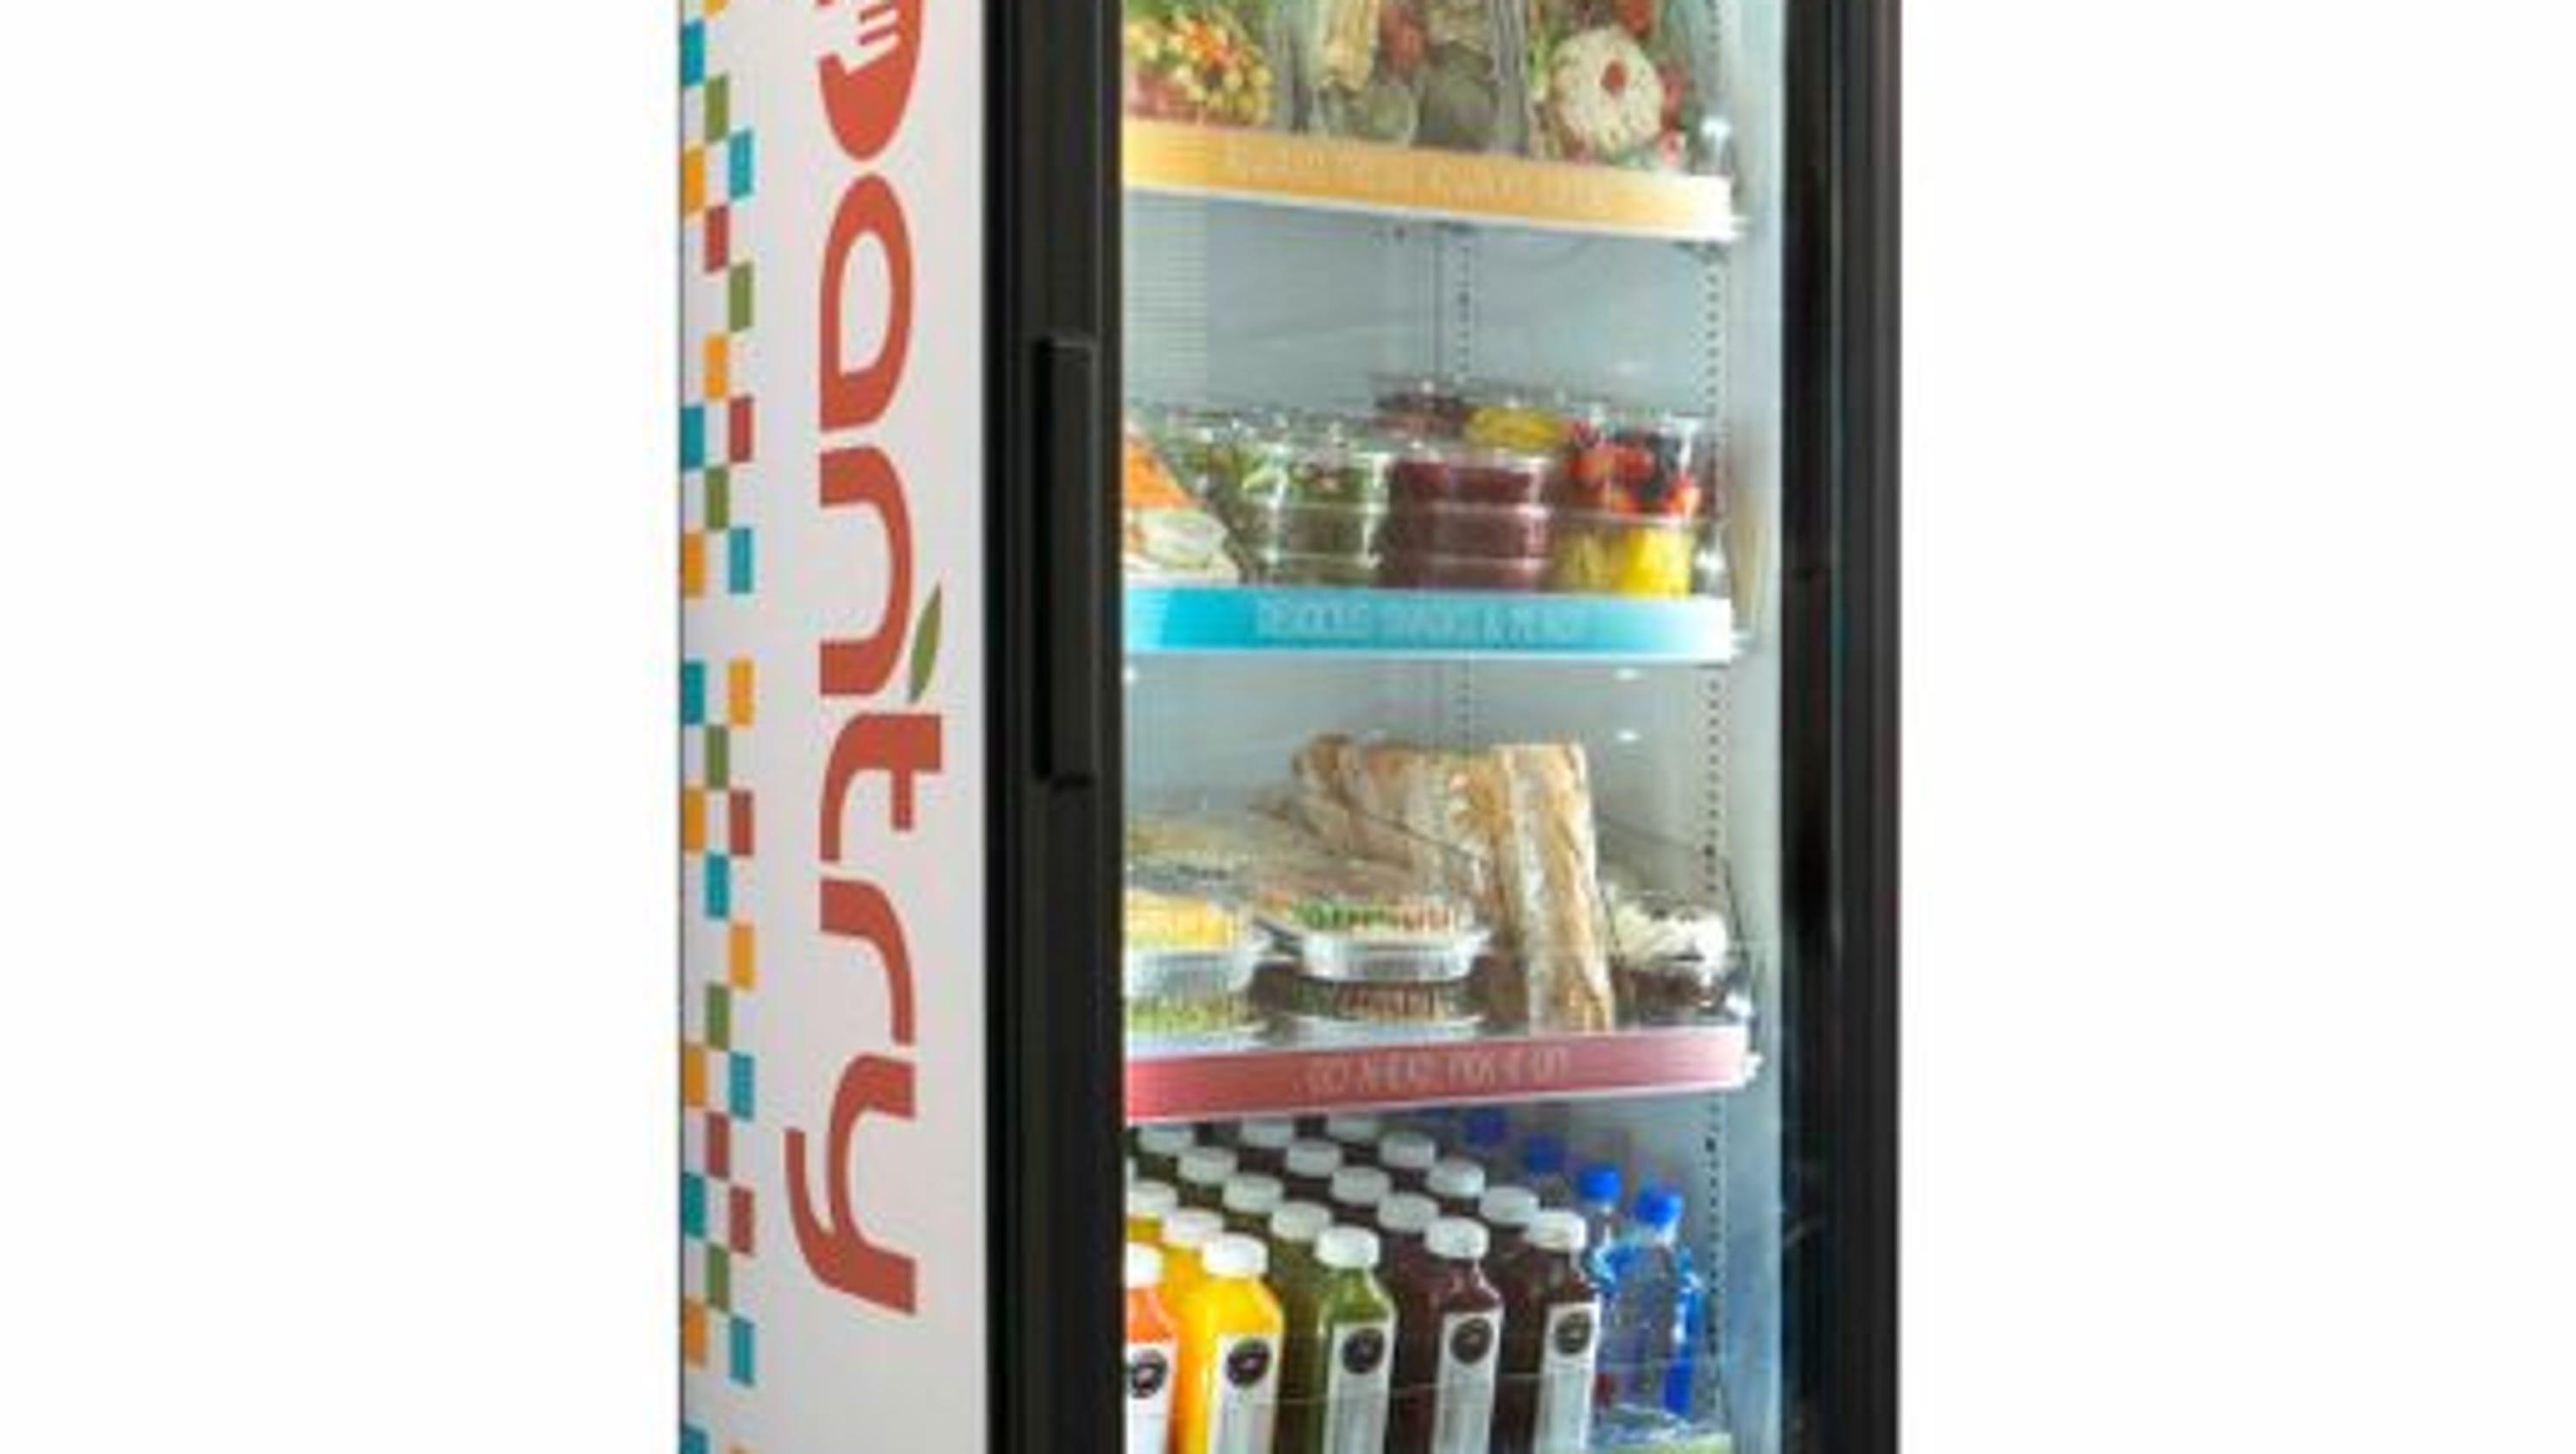 Vending Machines Get A High Tech Makeover